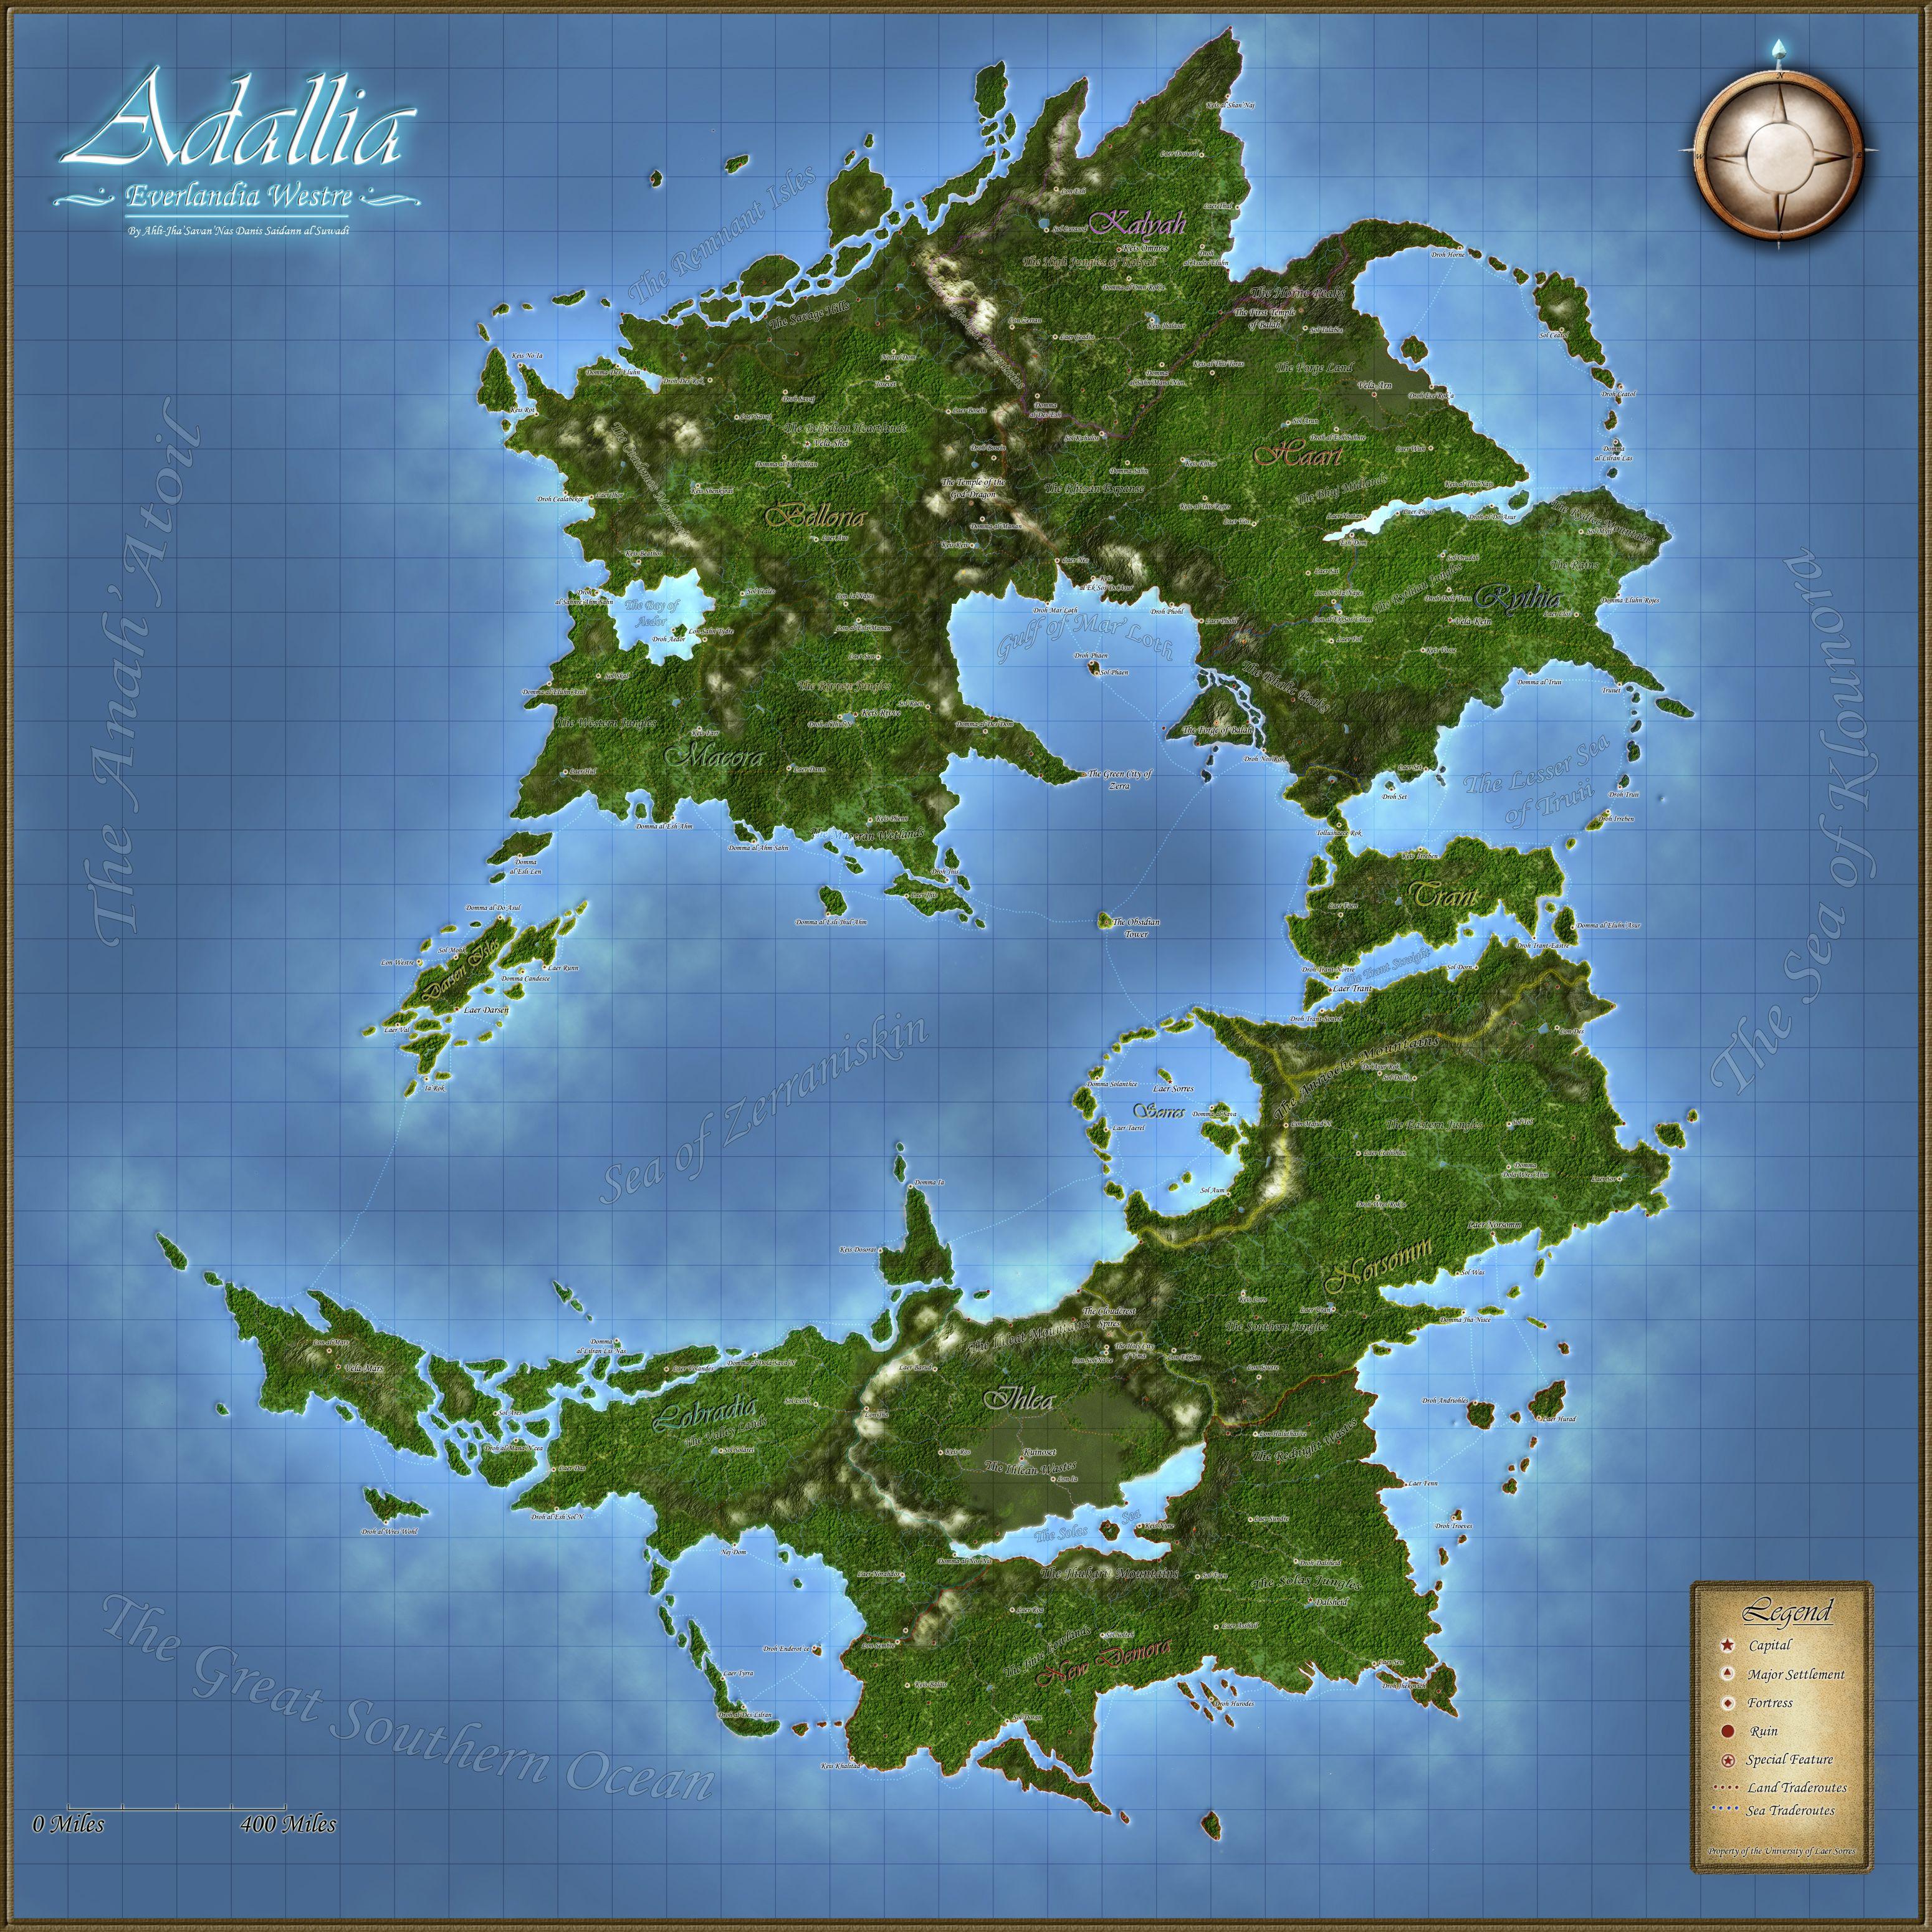 Pin by Richard Grunberg on World Maps   Pinterest   Fantasy map, Map ...